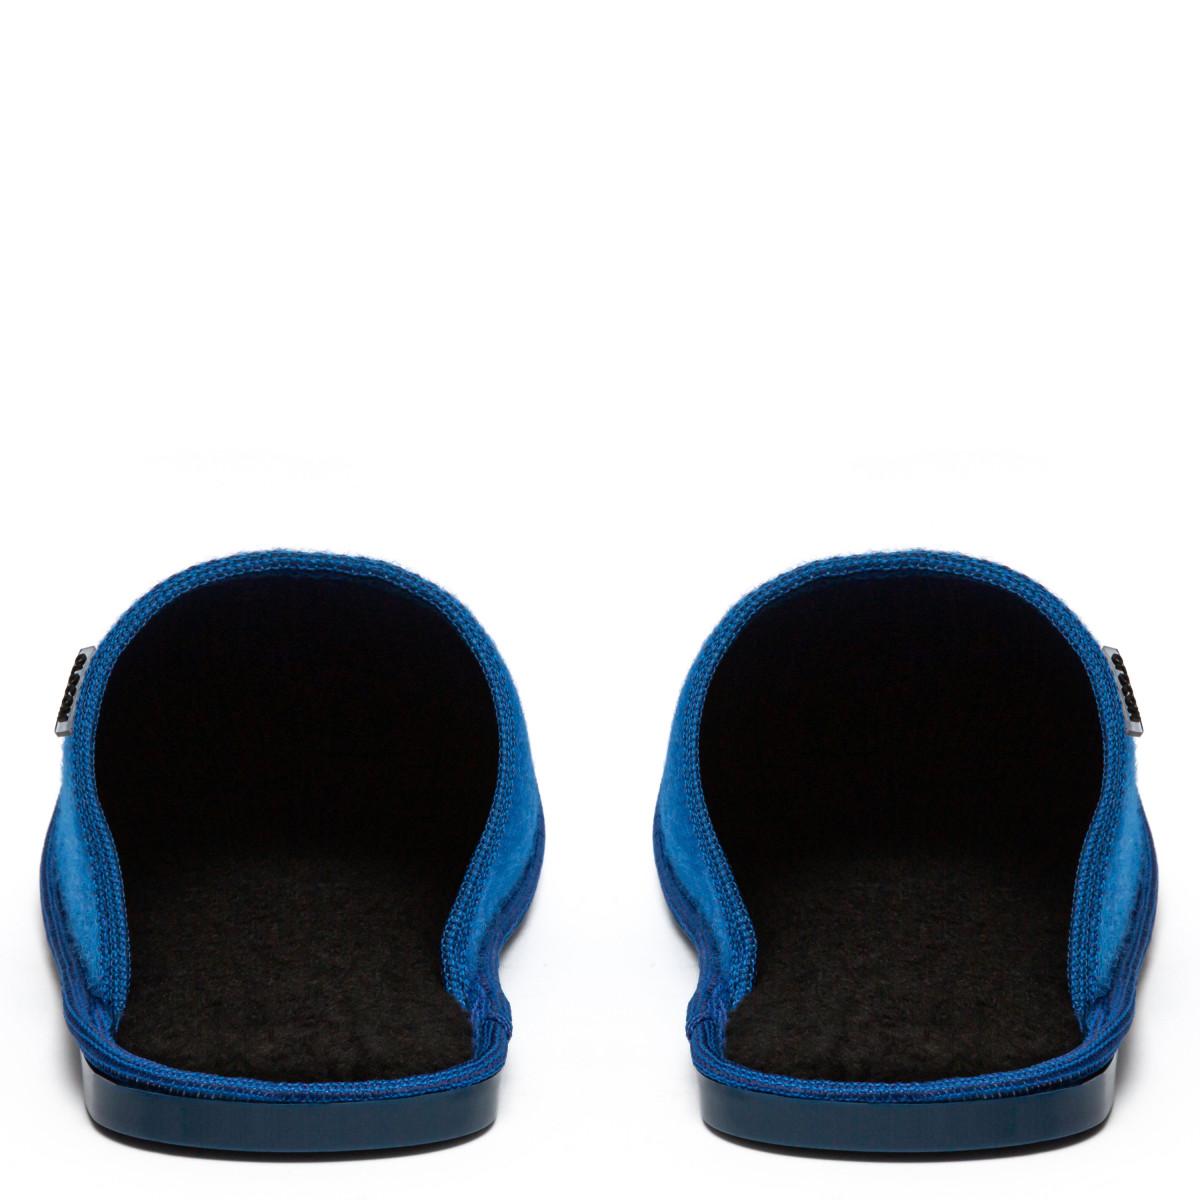 Men's Home slippers RELAX, Blue